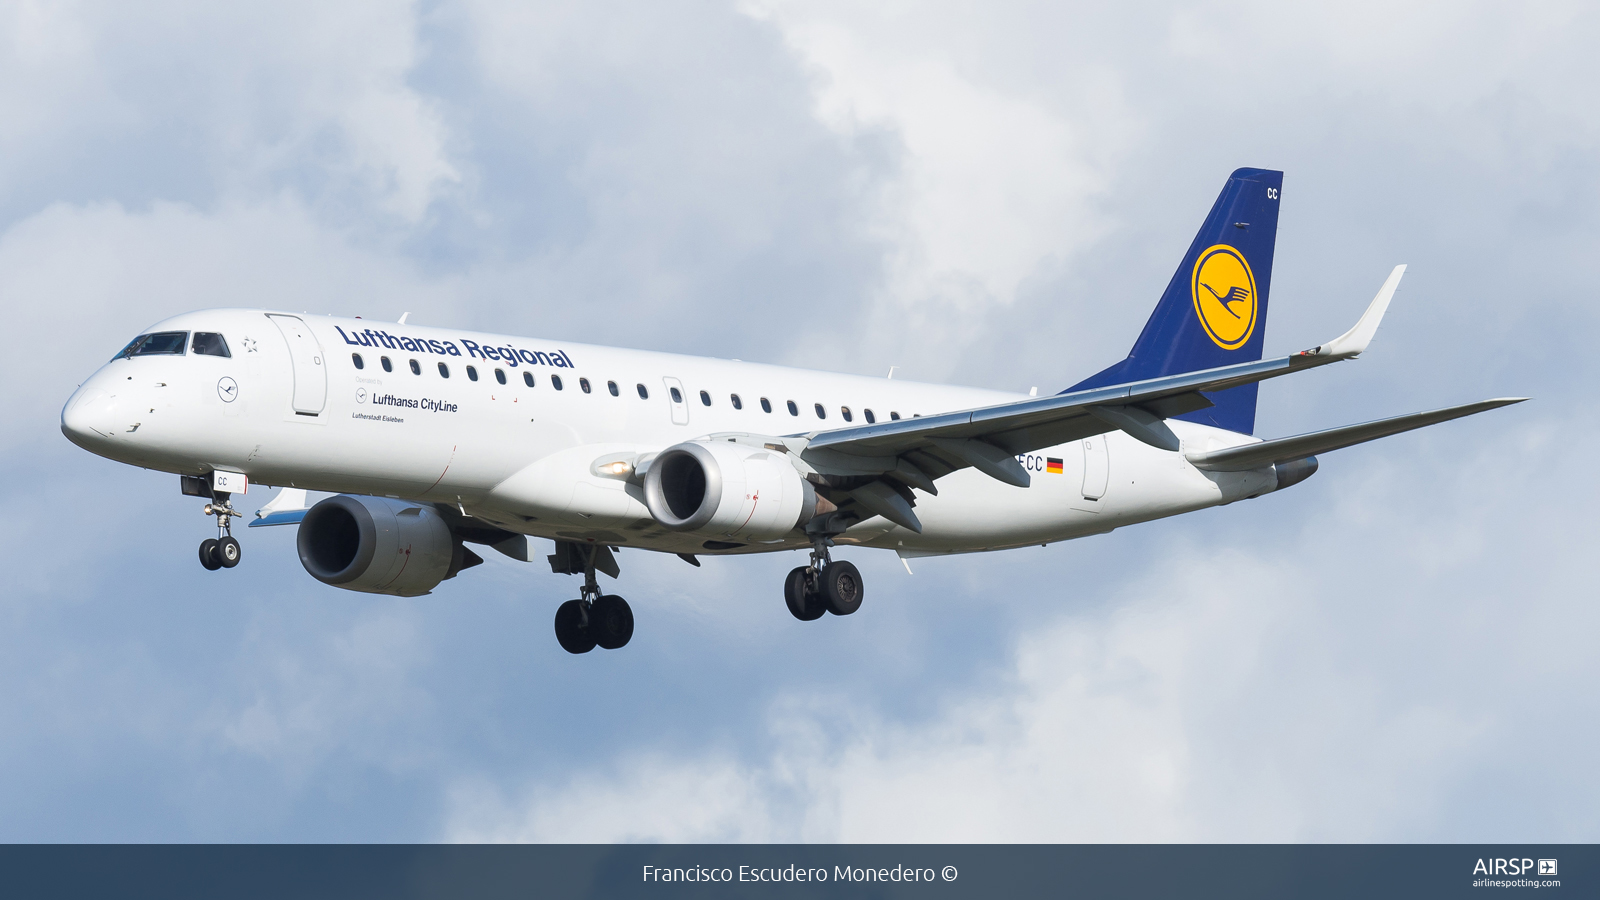 Lufthansa Cityline  Embraer E190  D-AECC